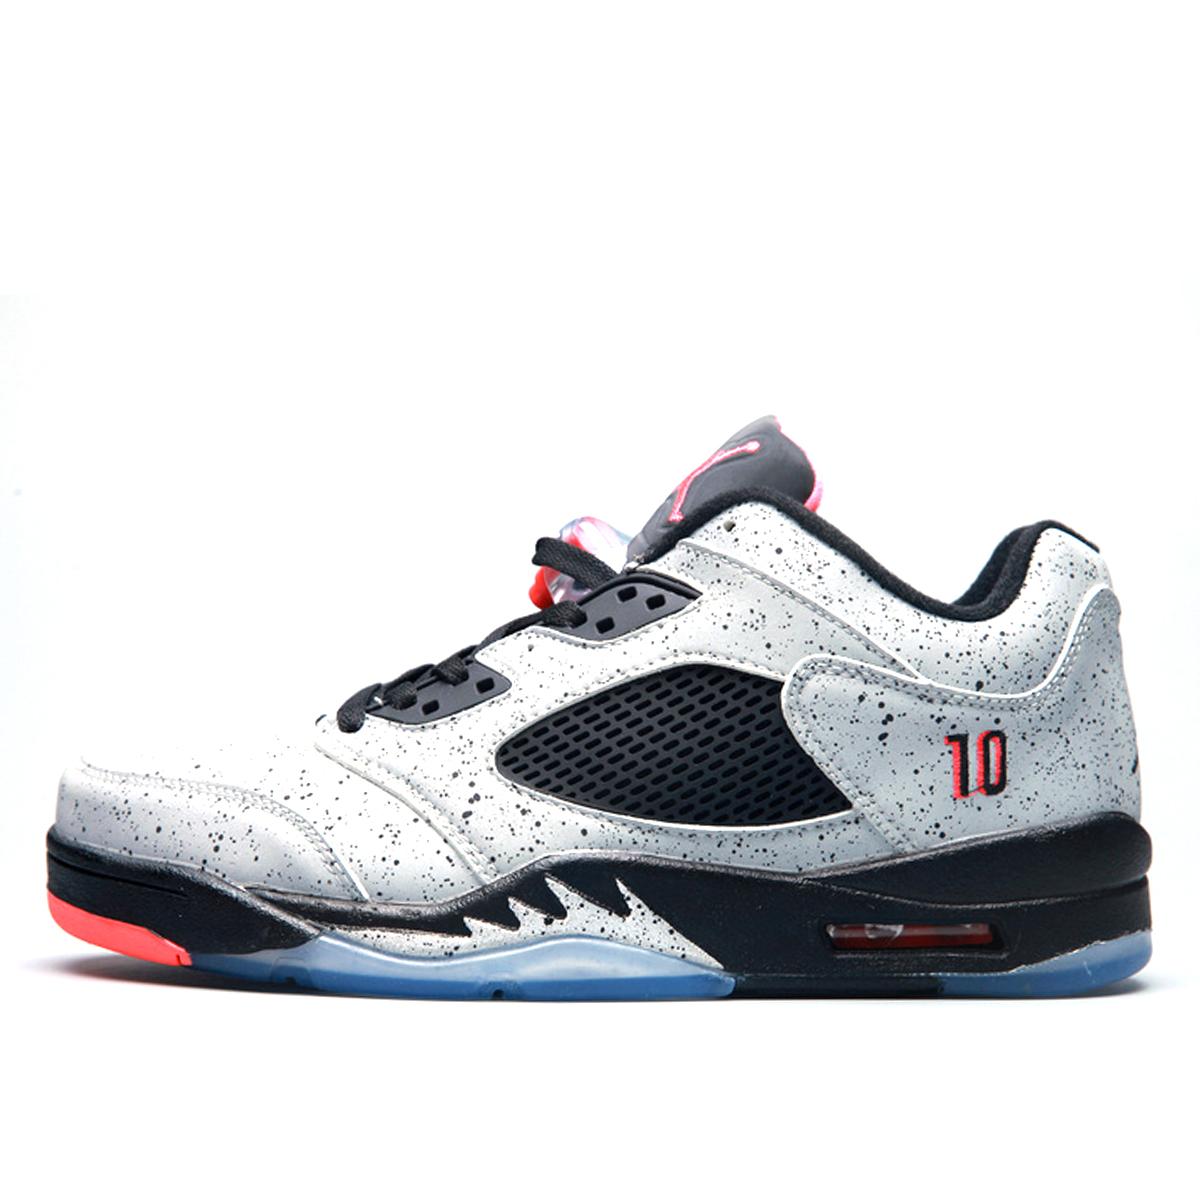 Air Jordan Nike AJ 5 V Retro Low Neymar